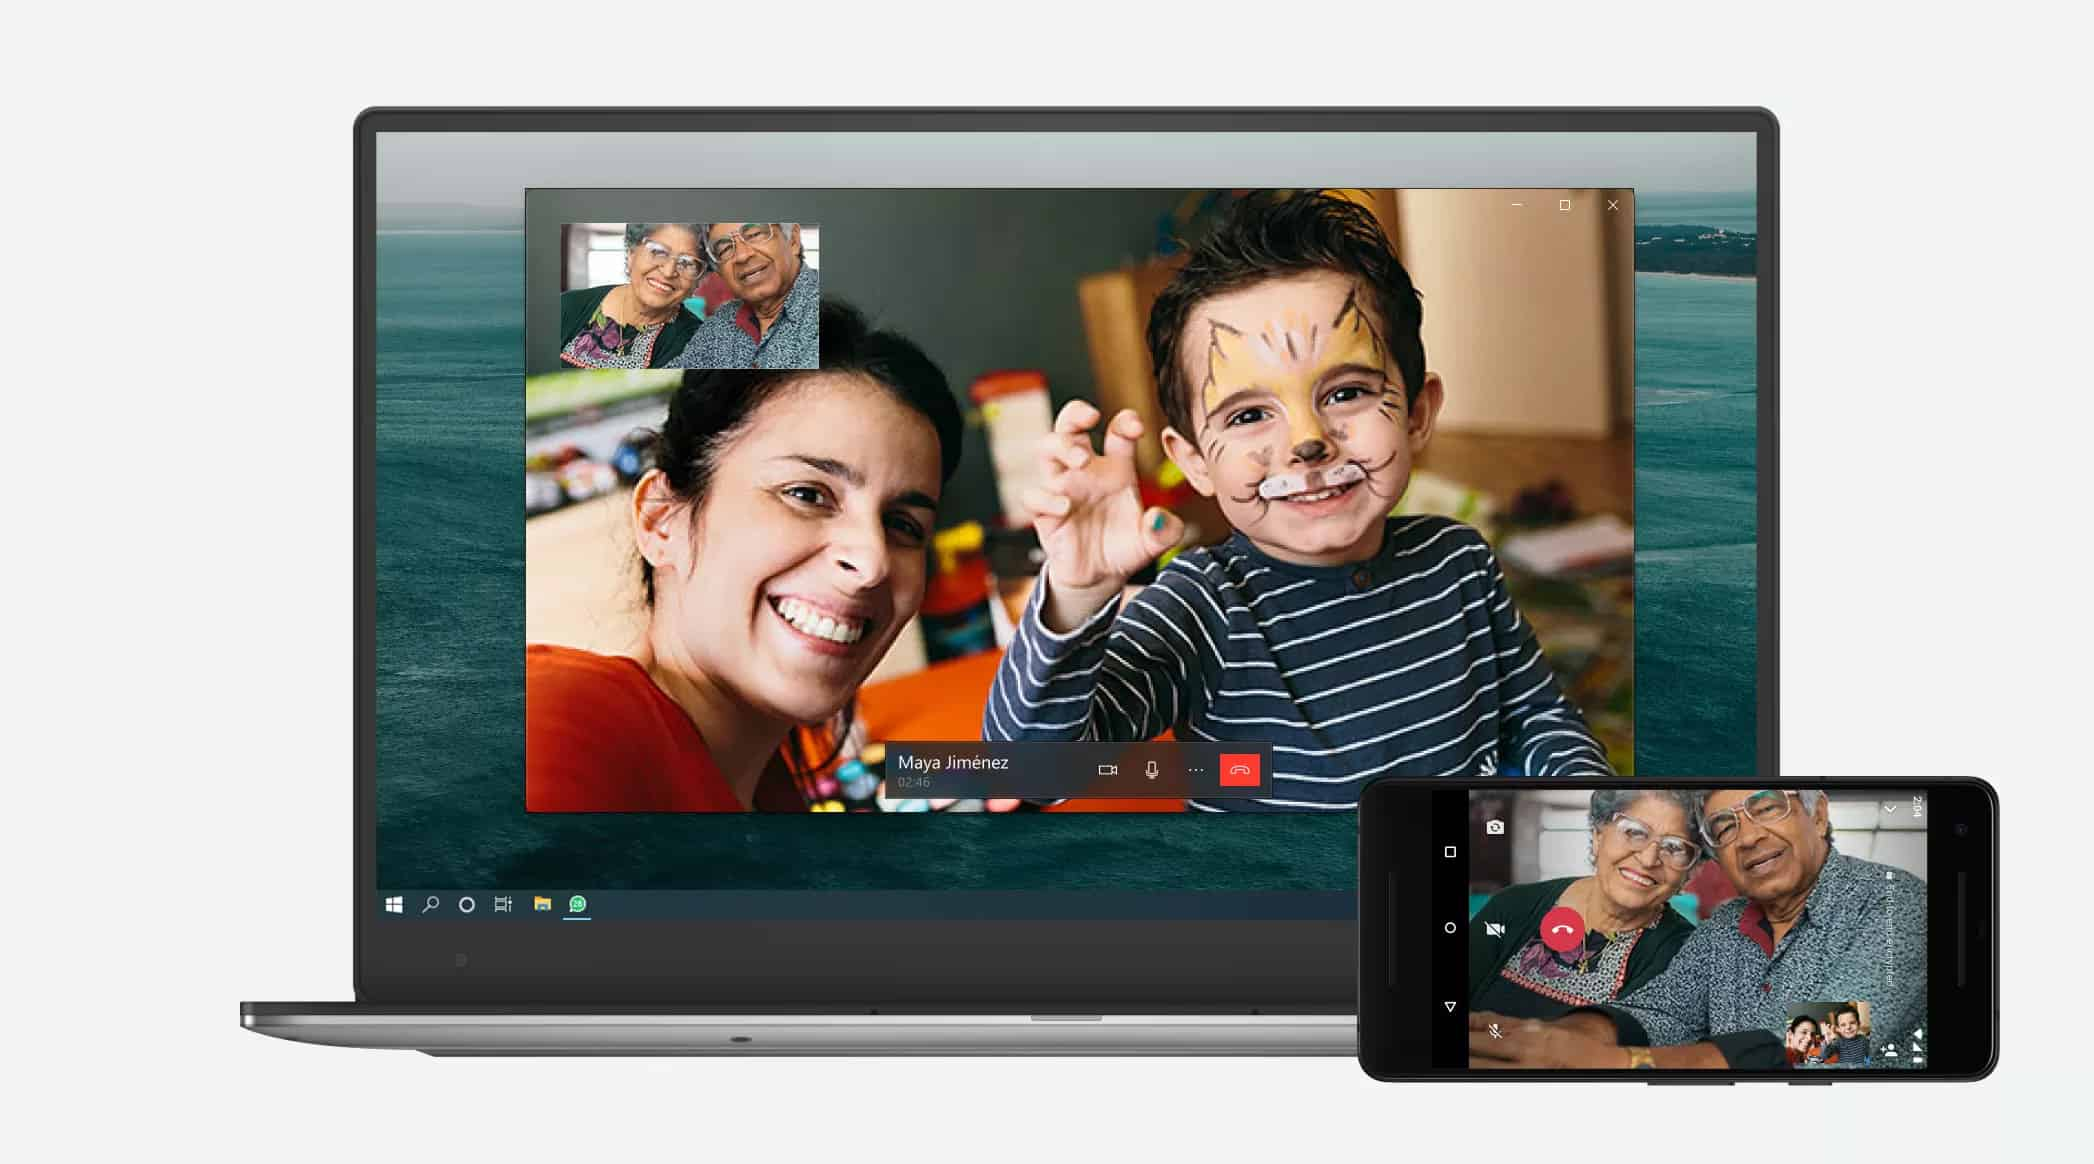 WhatsApp Desktop App Gets Voice & Video Calling Features